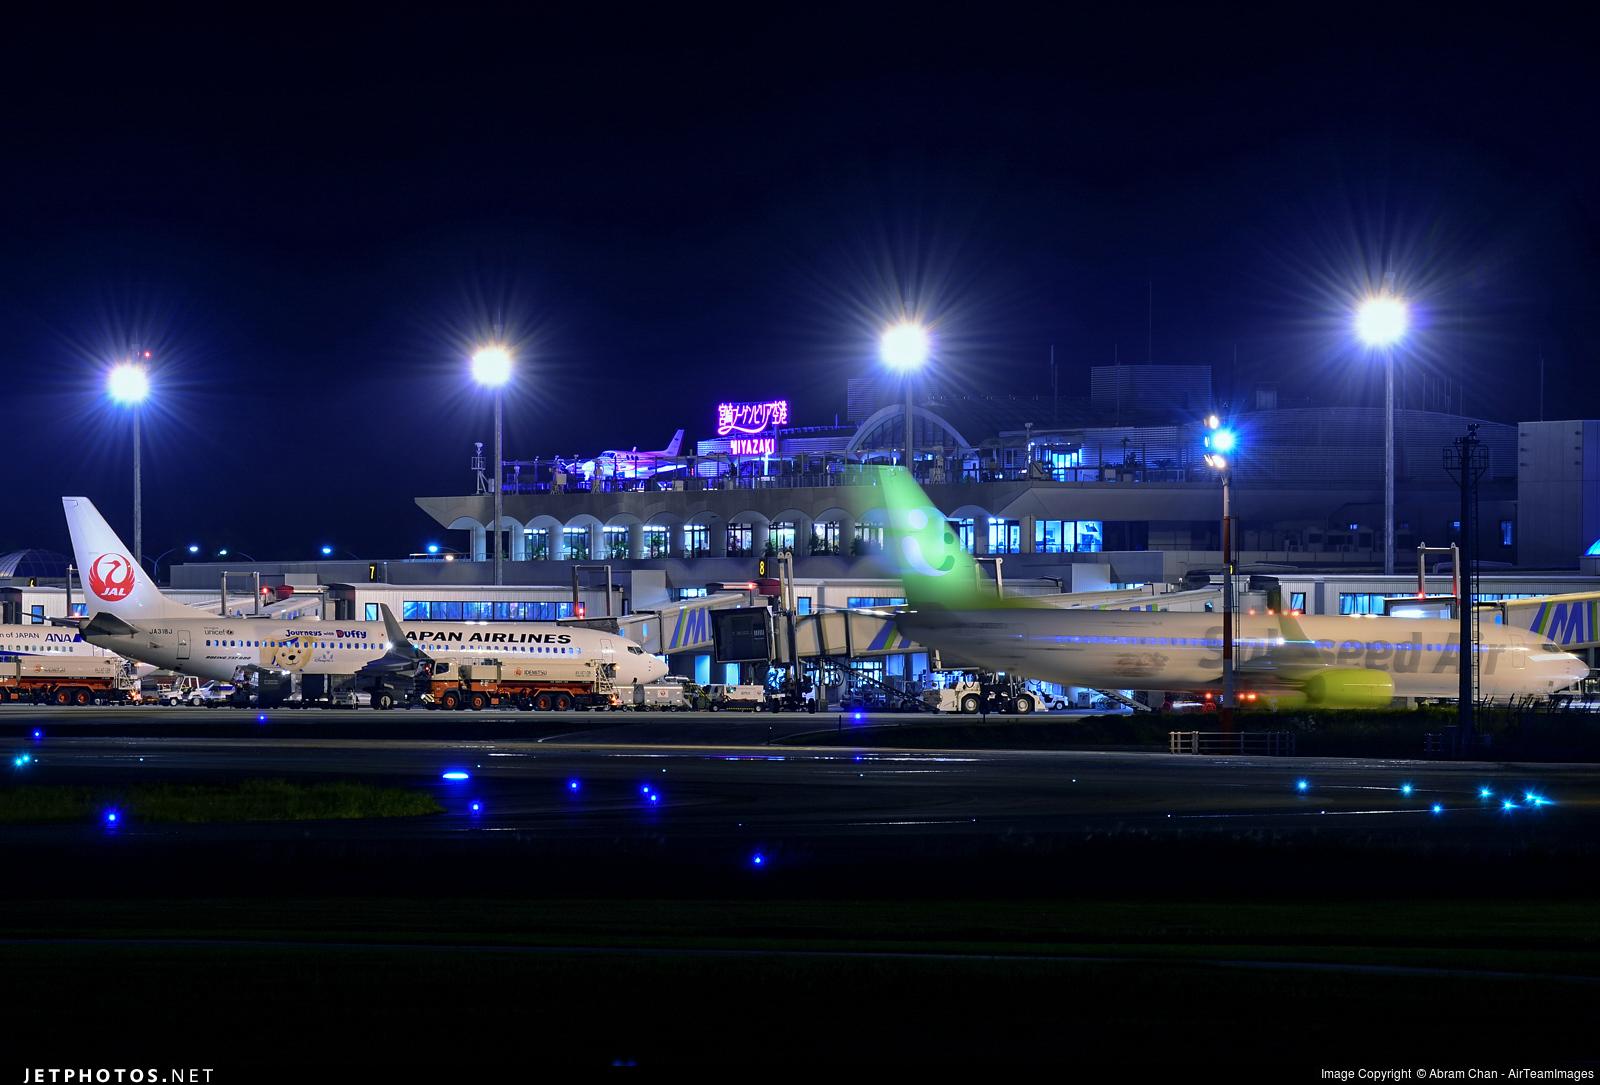 RJFM - Airport - Ramp